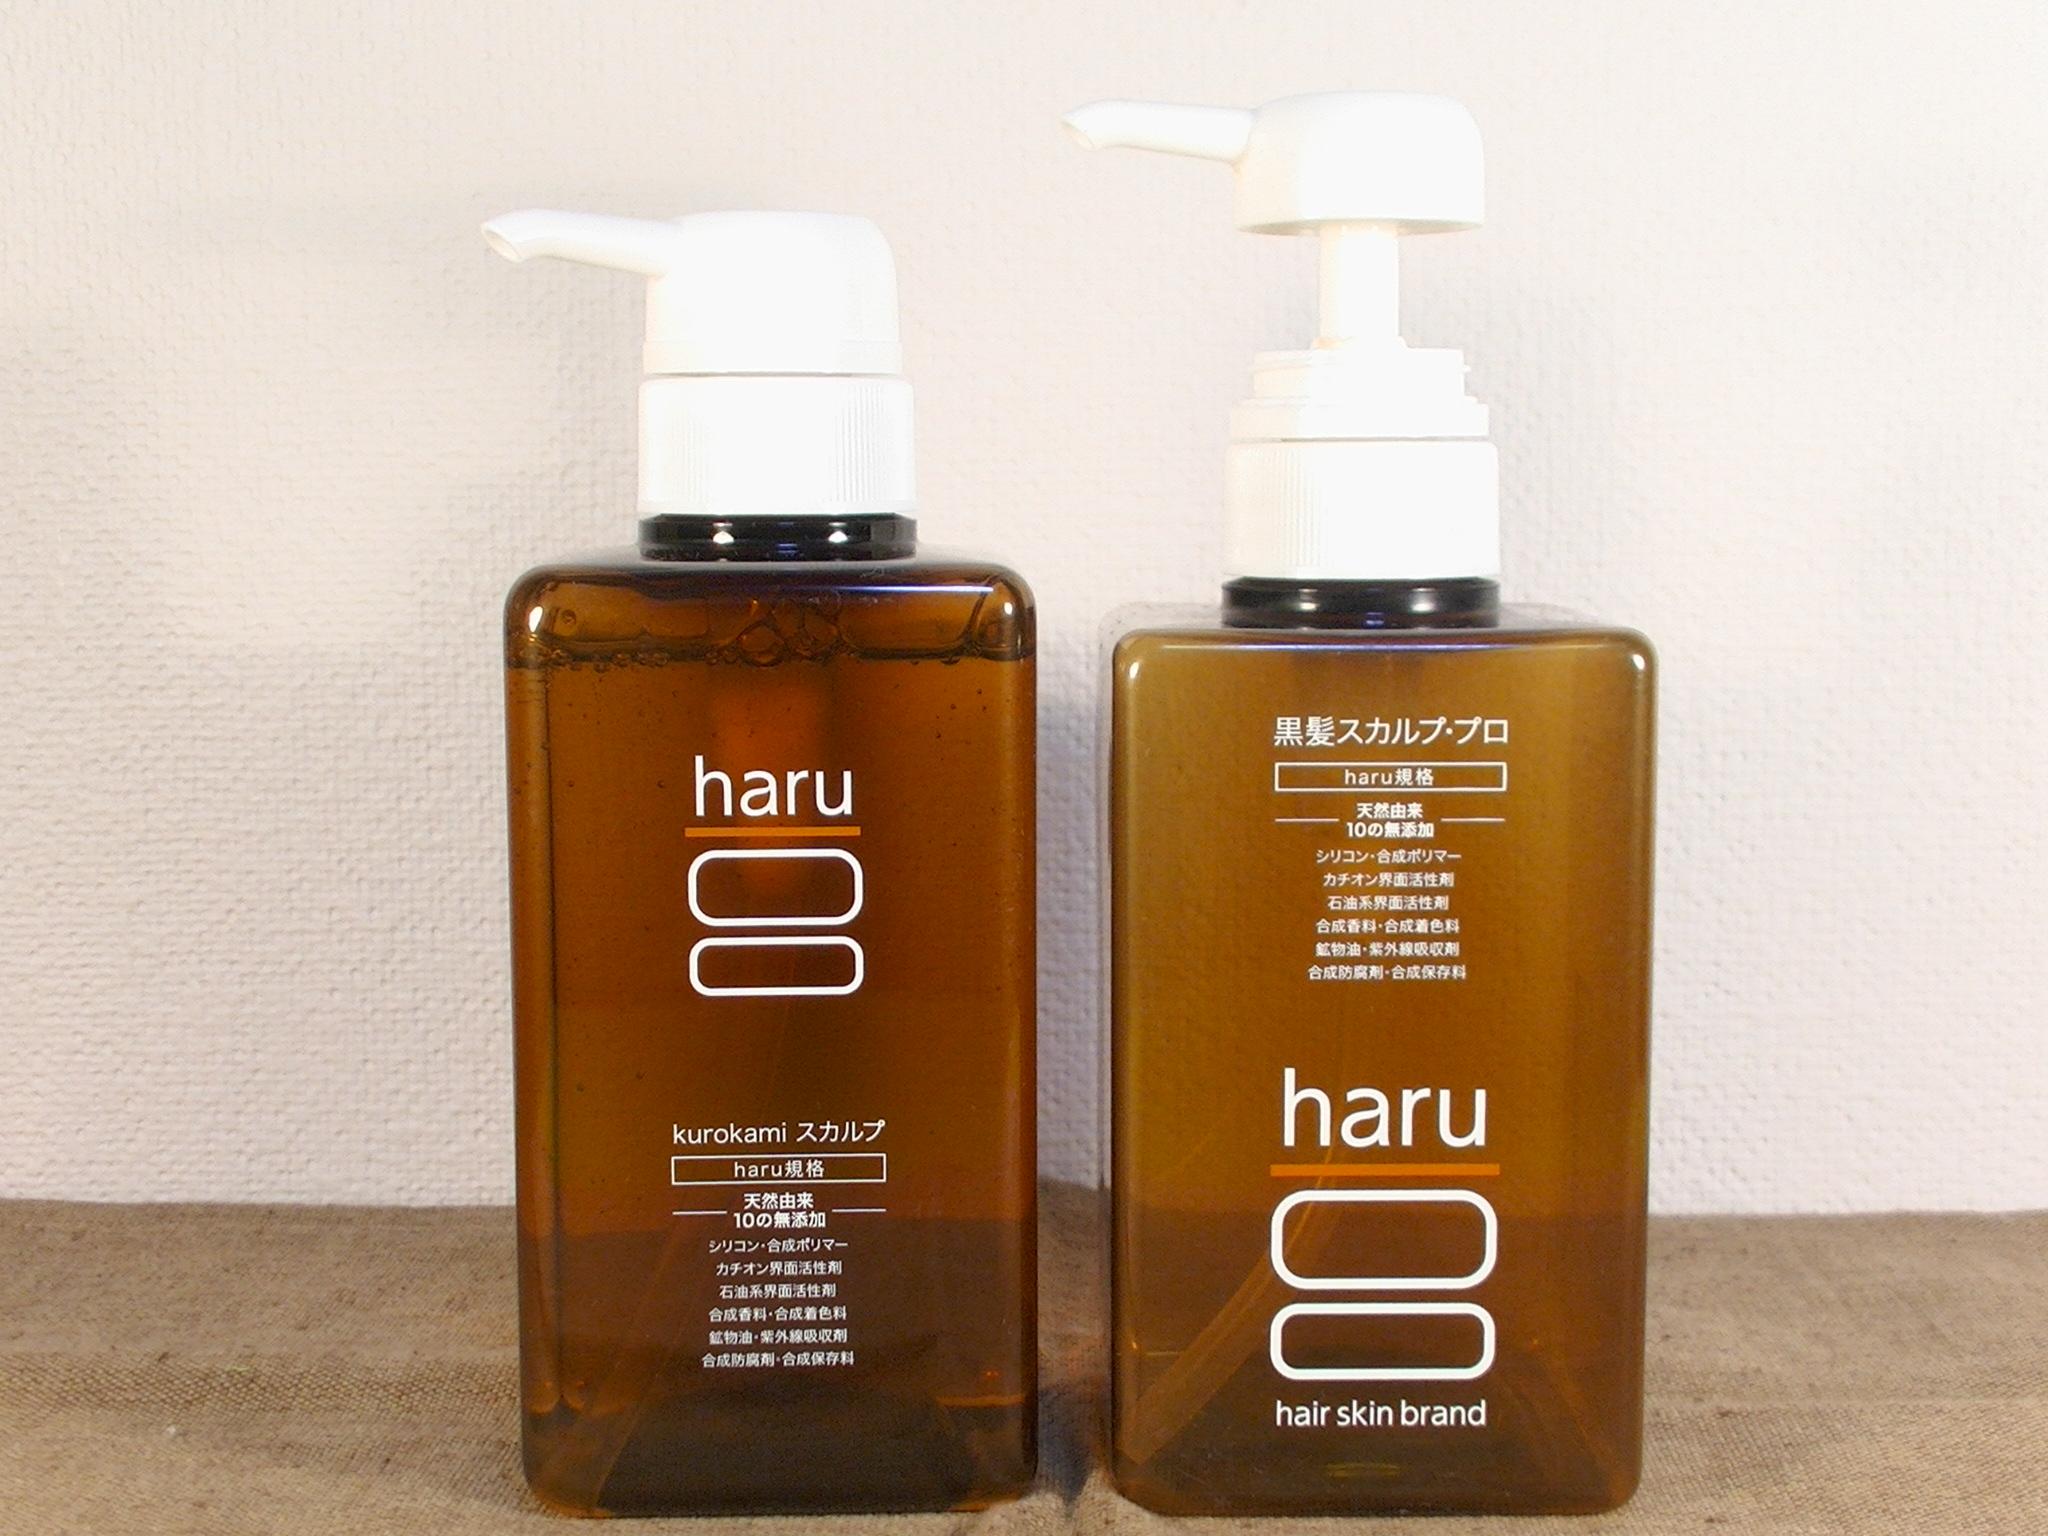 harukurokamiスカルプ_newdesign_by_haru黒髪スカルプ・プロ